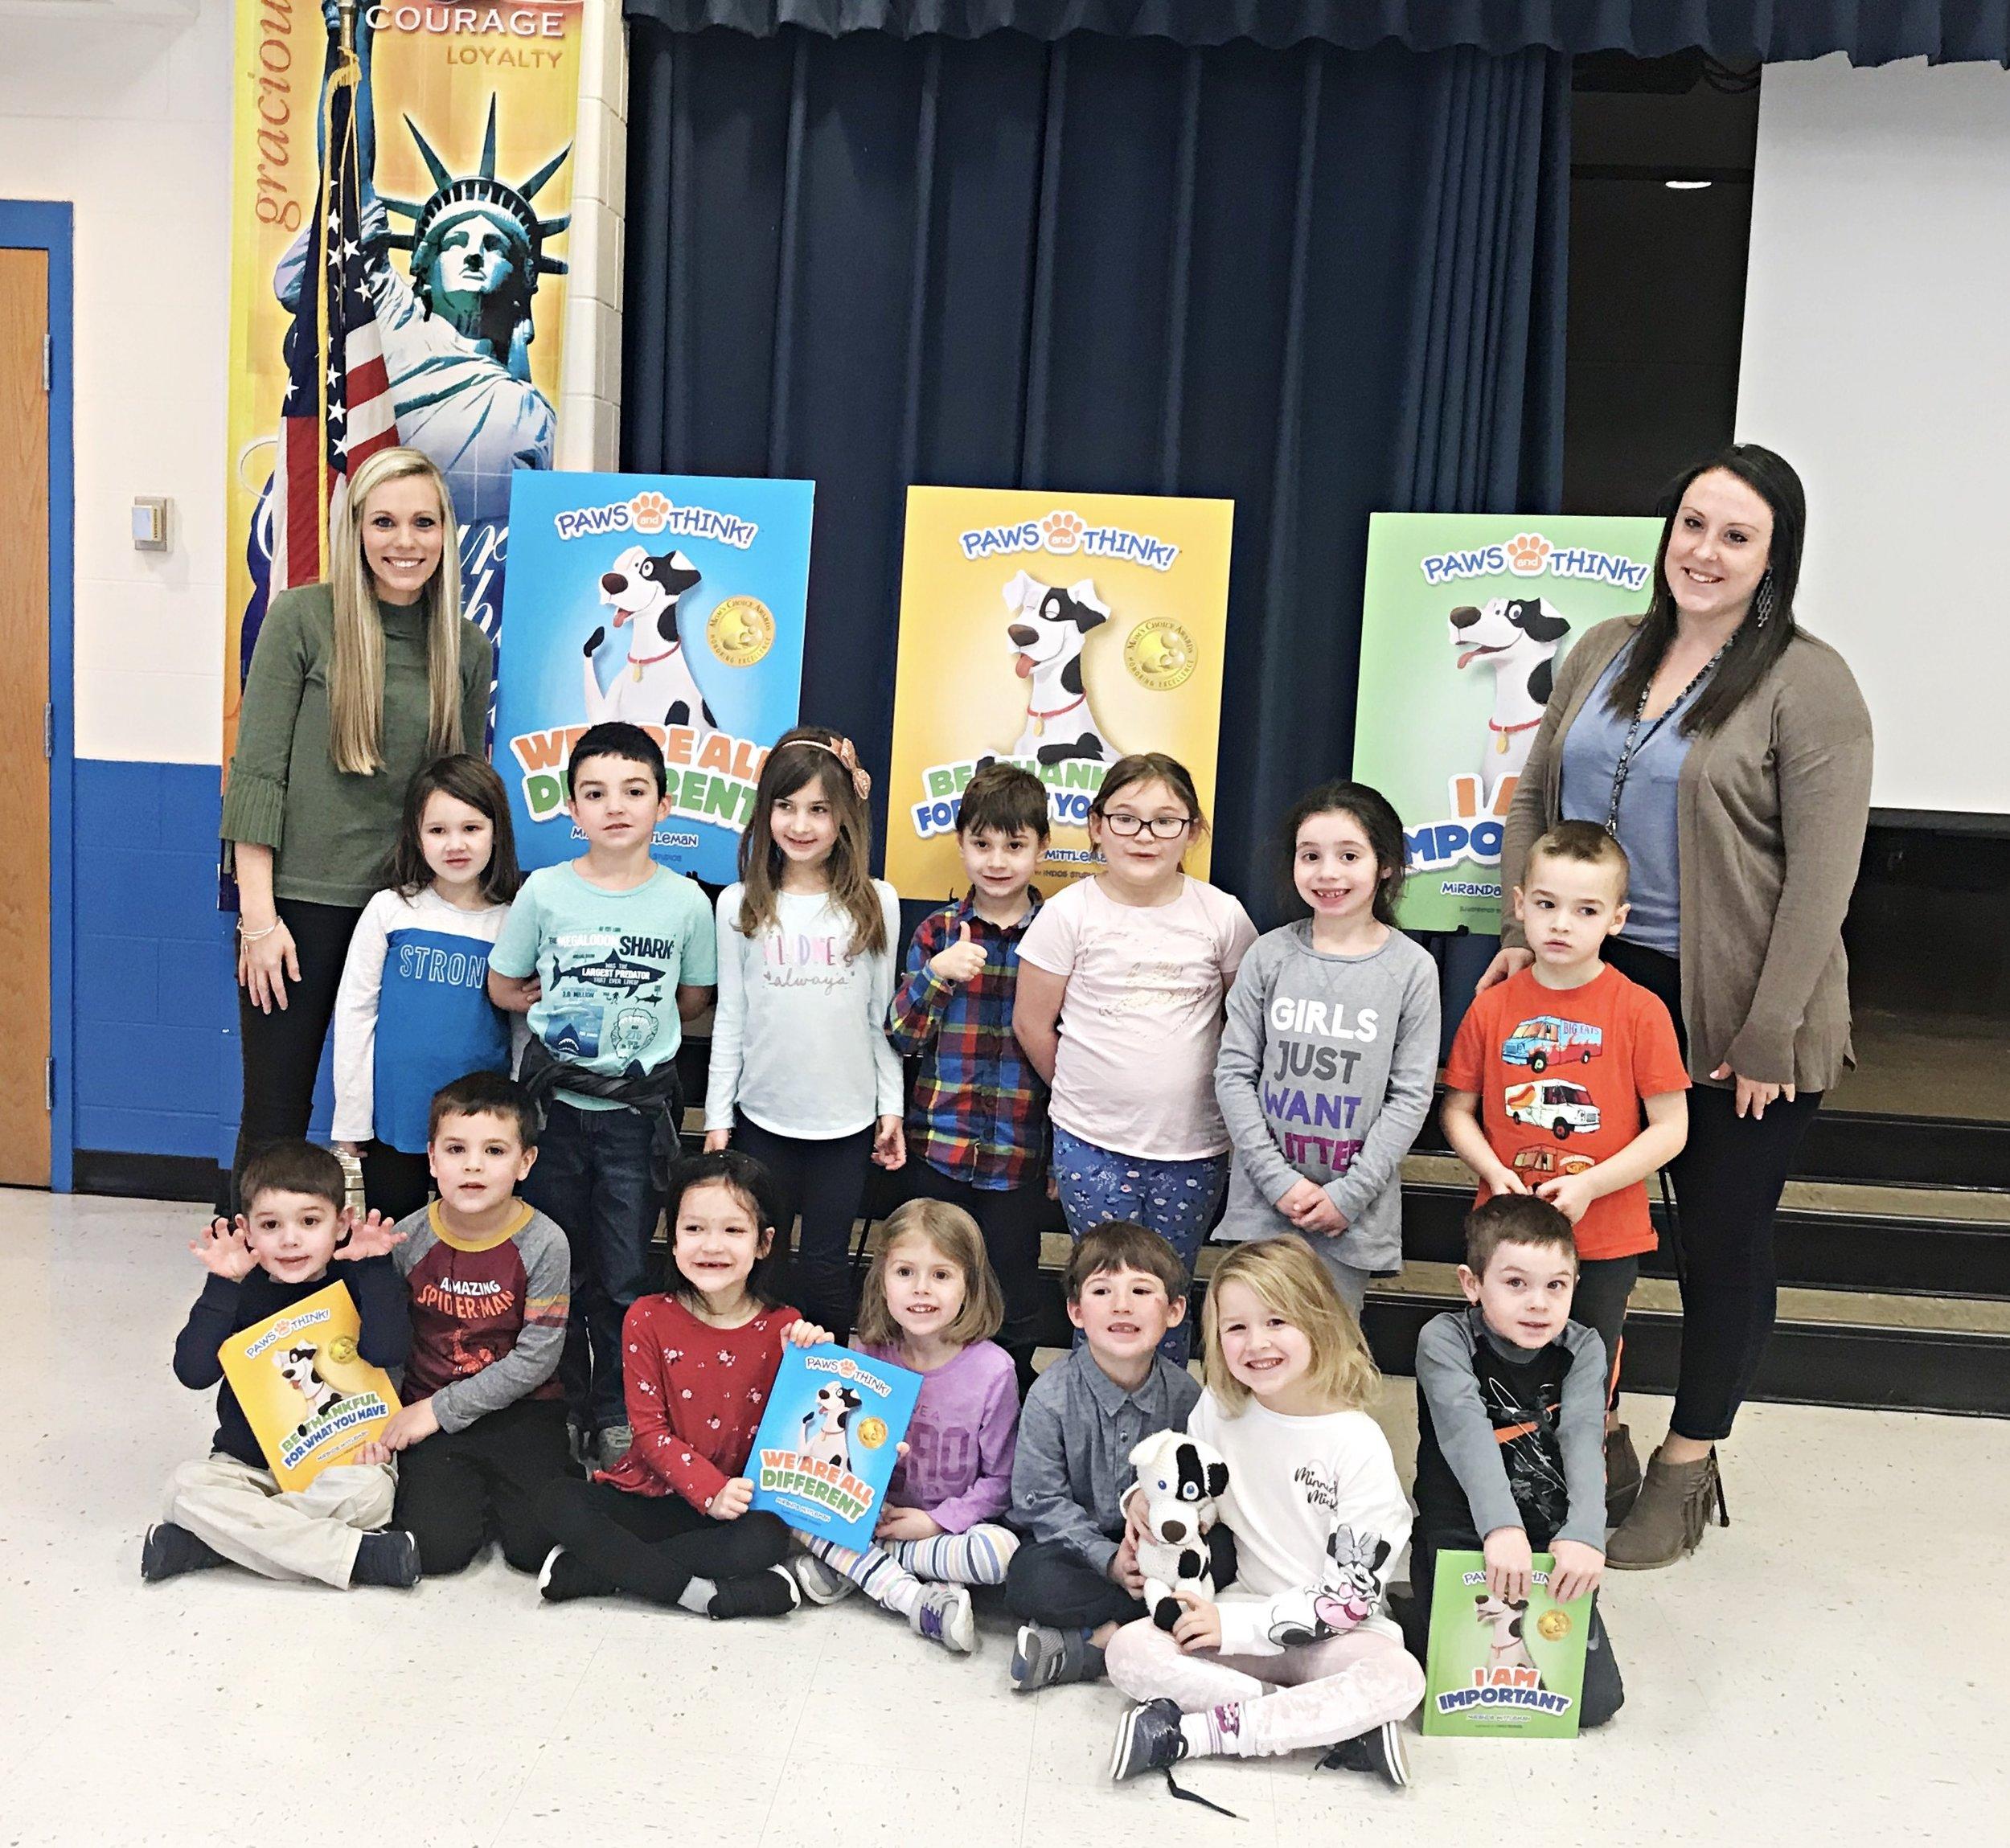 Winfield Elementary